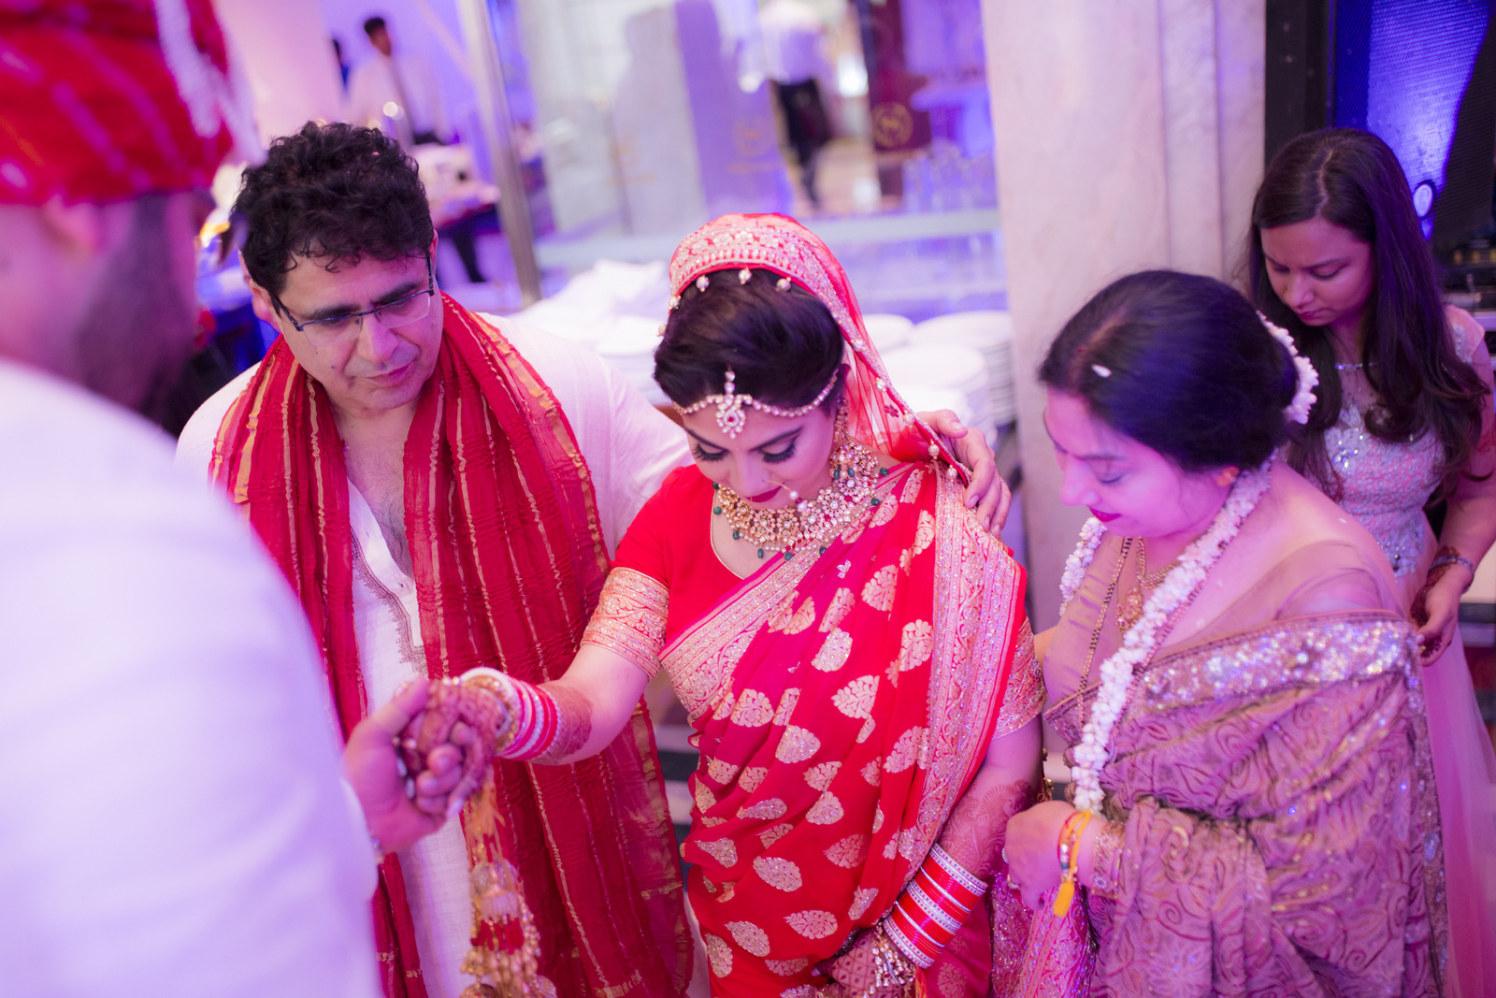 Ravishing Bride In Crimson Red Lehenga With Golden Embroidery by Arpit Gulati Wedding-photography   Weddings Photos & Ideas